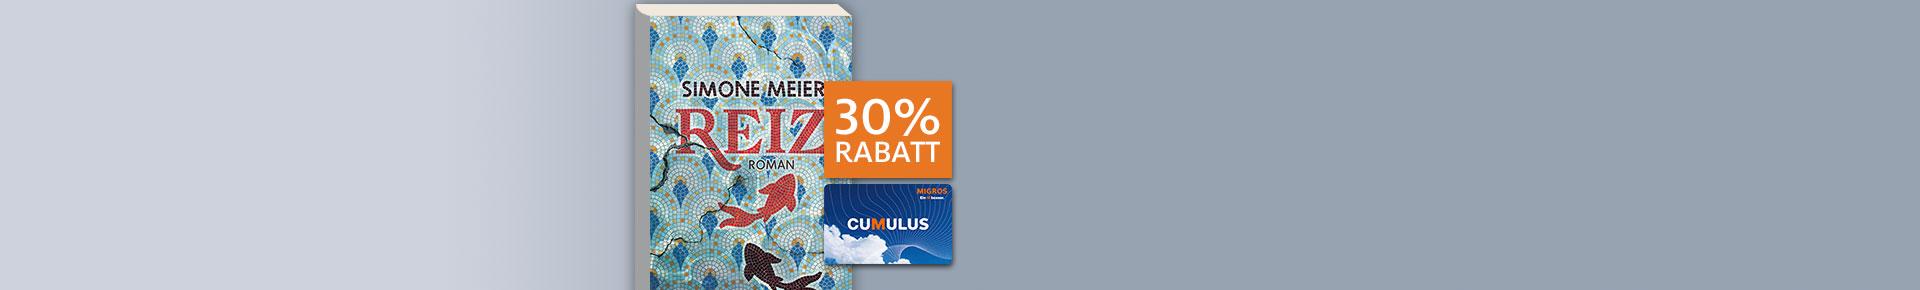 Cumulus-Angebot: 30% Rabatt auf «Reiz»